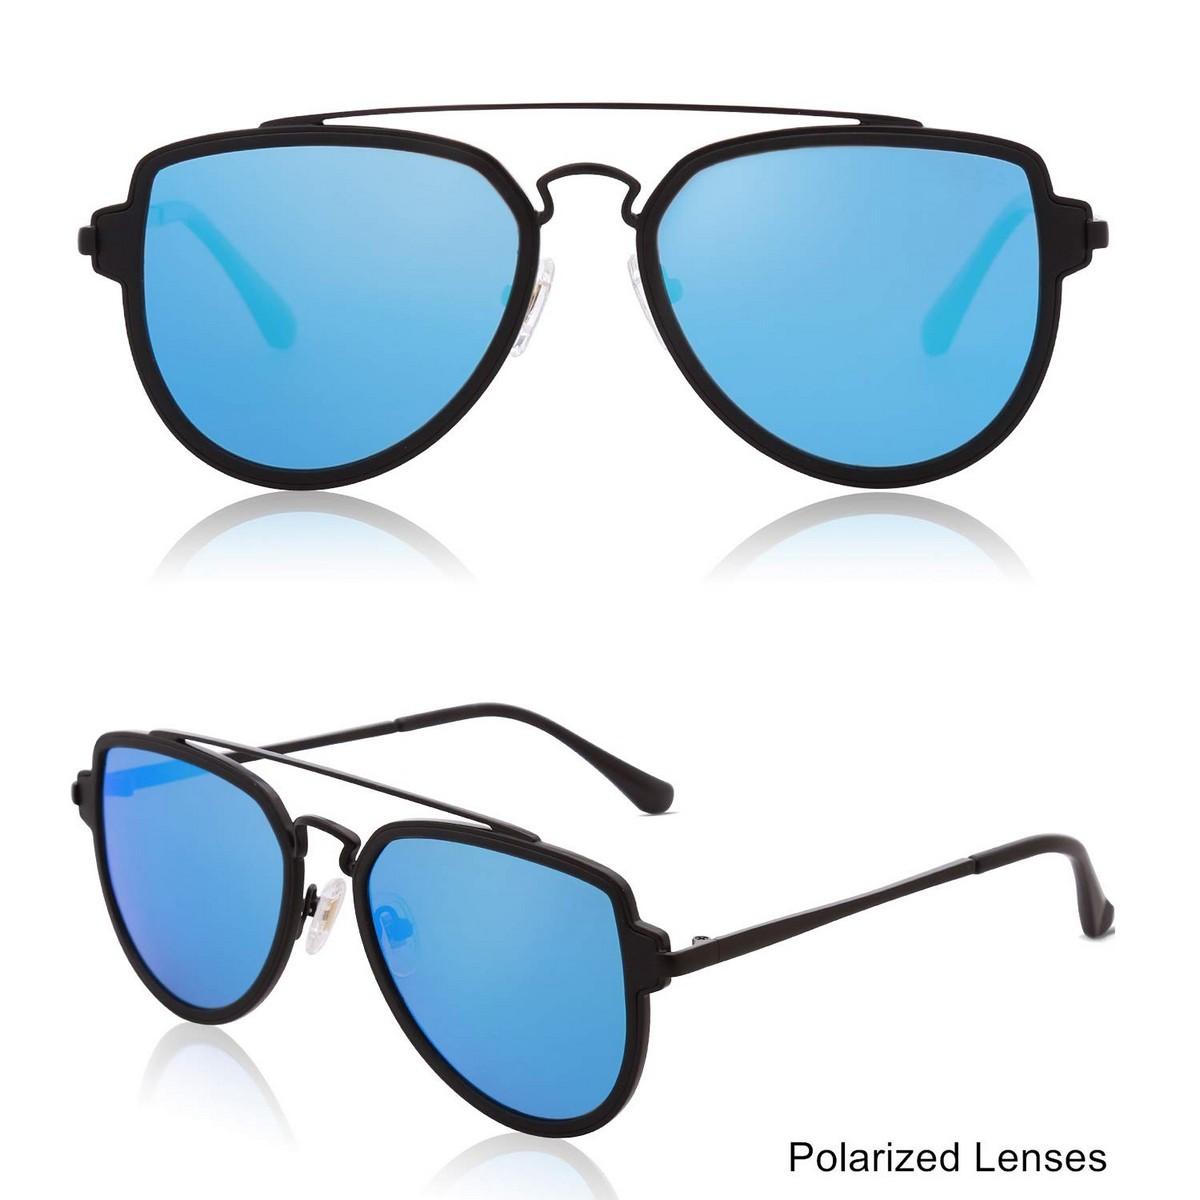 Double Bridge Black Blue Mirror Polarized Sunglasses